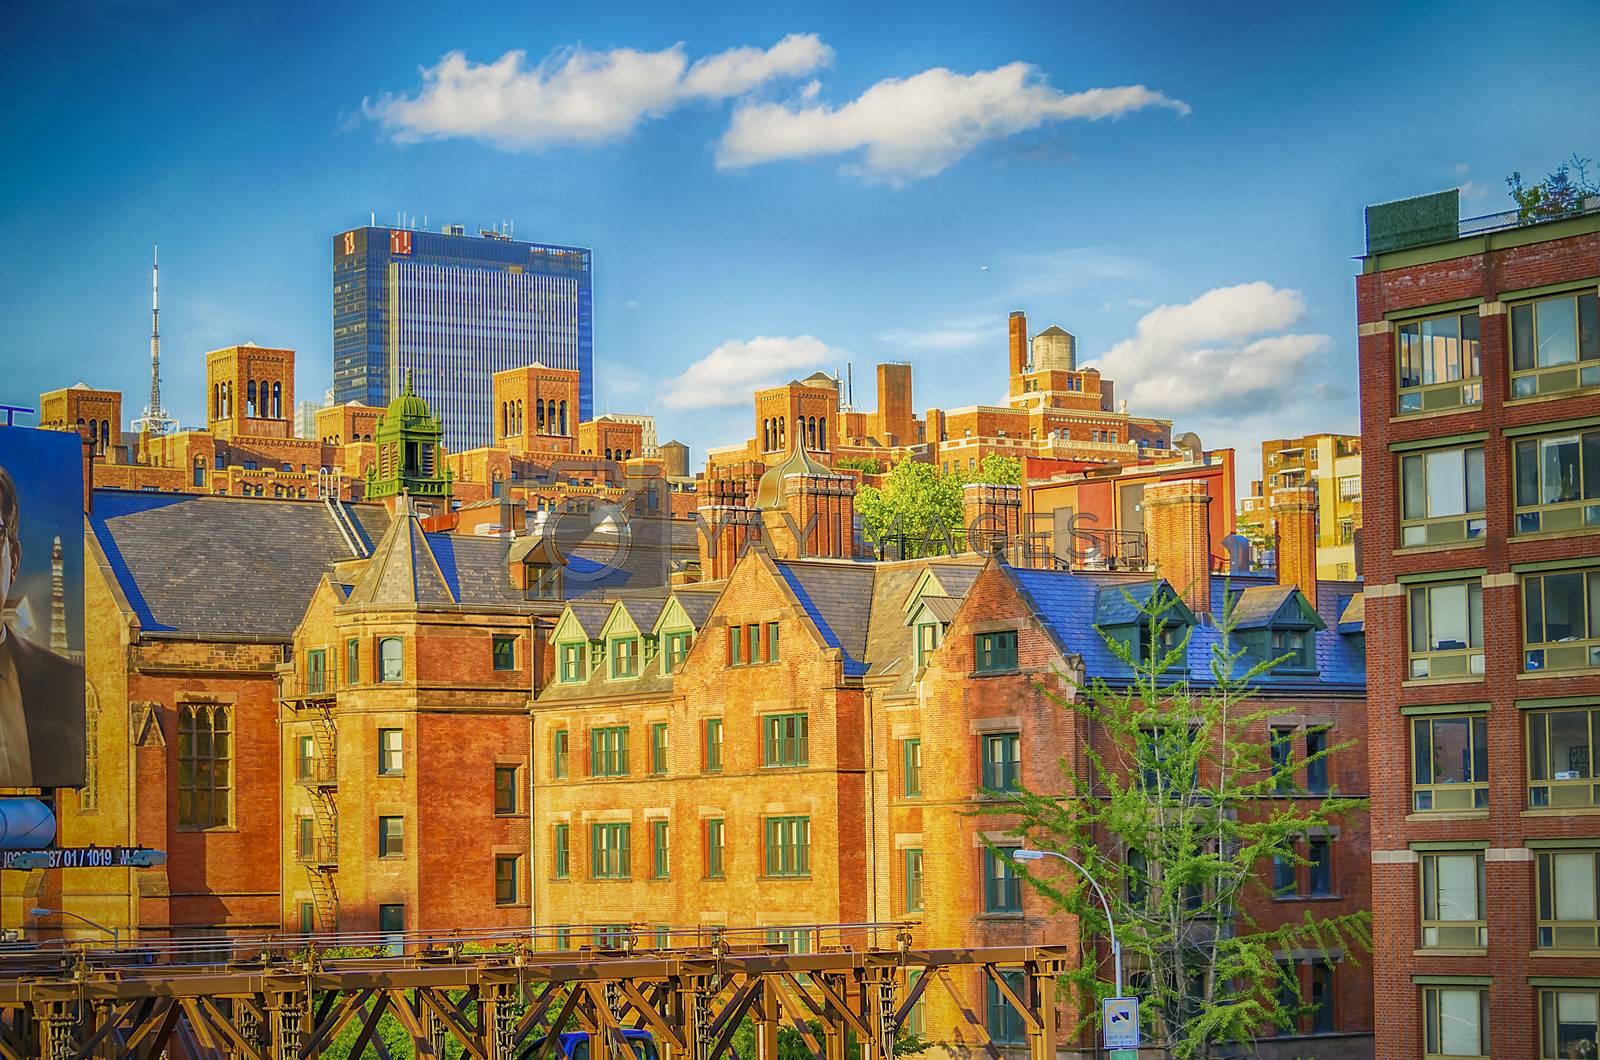 Red Brick Buildings at Chelsea, Midtown Manhattan, New York City